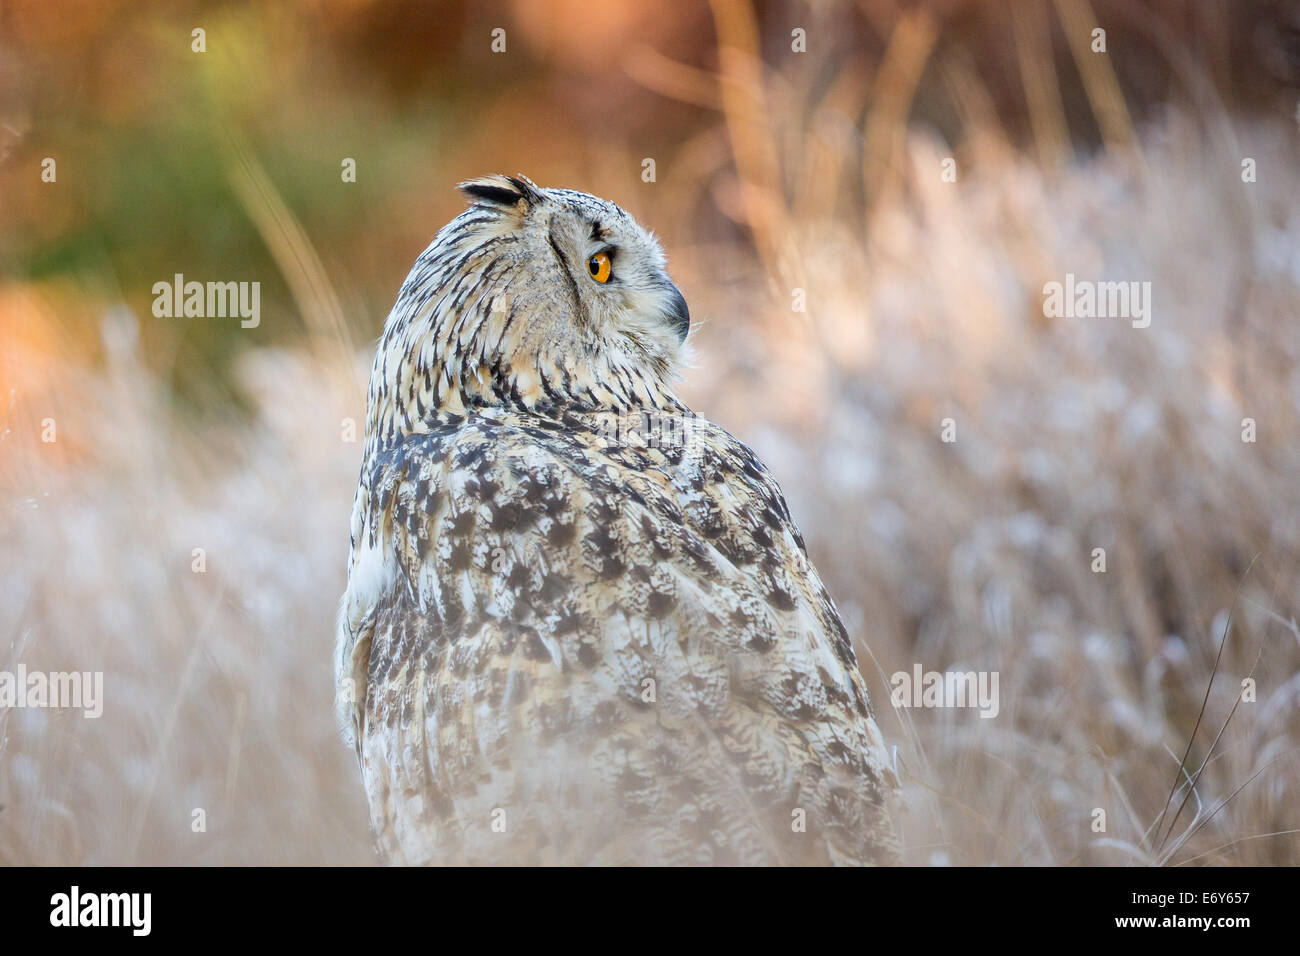 Siberean Eagle Owl (Bubo bubo sibiricus) in long grass (a sub-species of the Eurasian Eagle Owl Bubo Bubo) - Stock Image